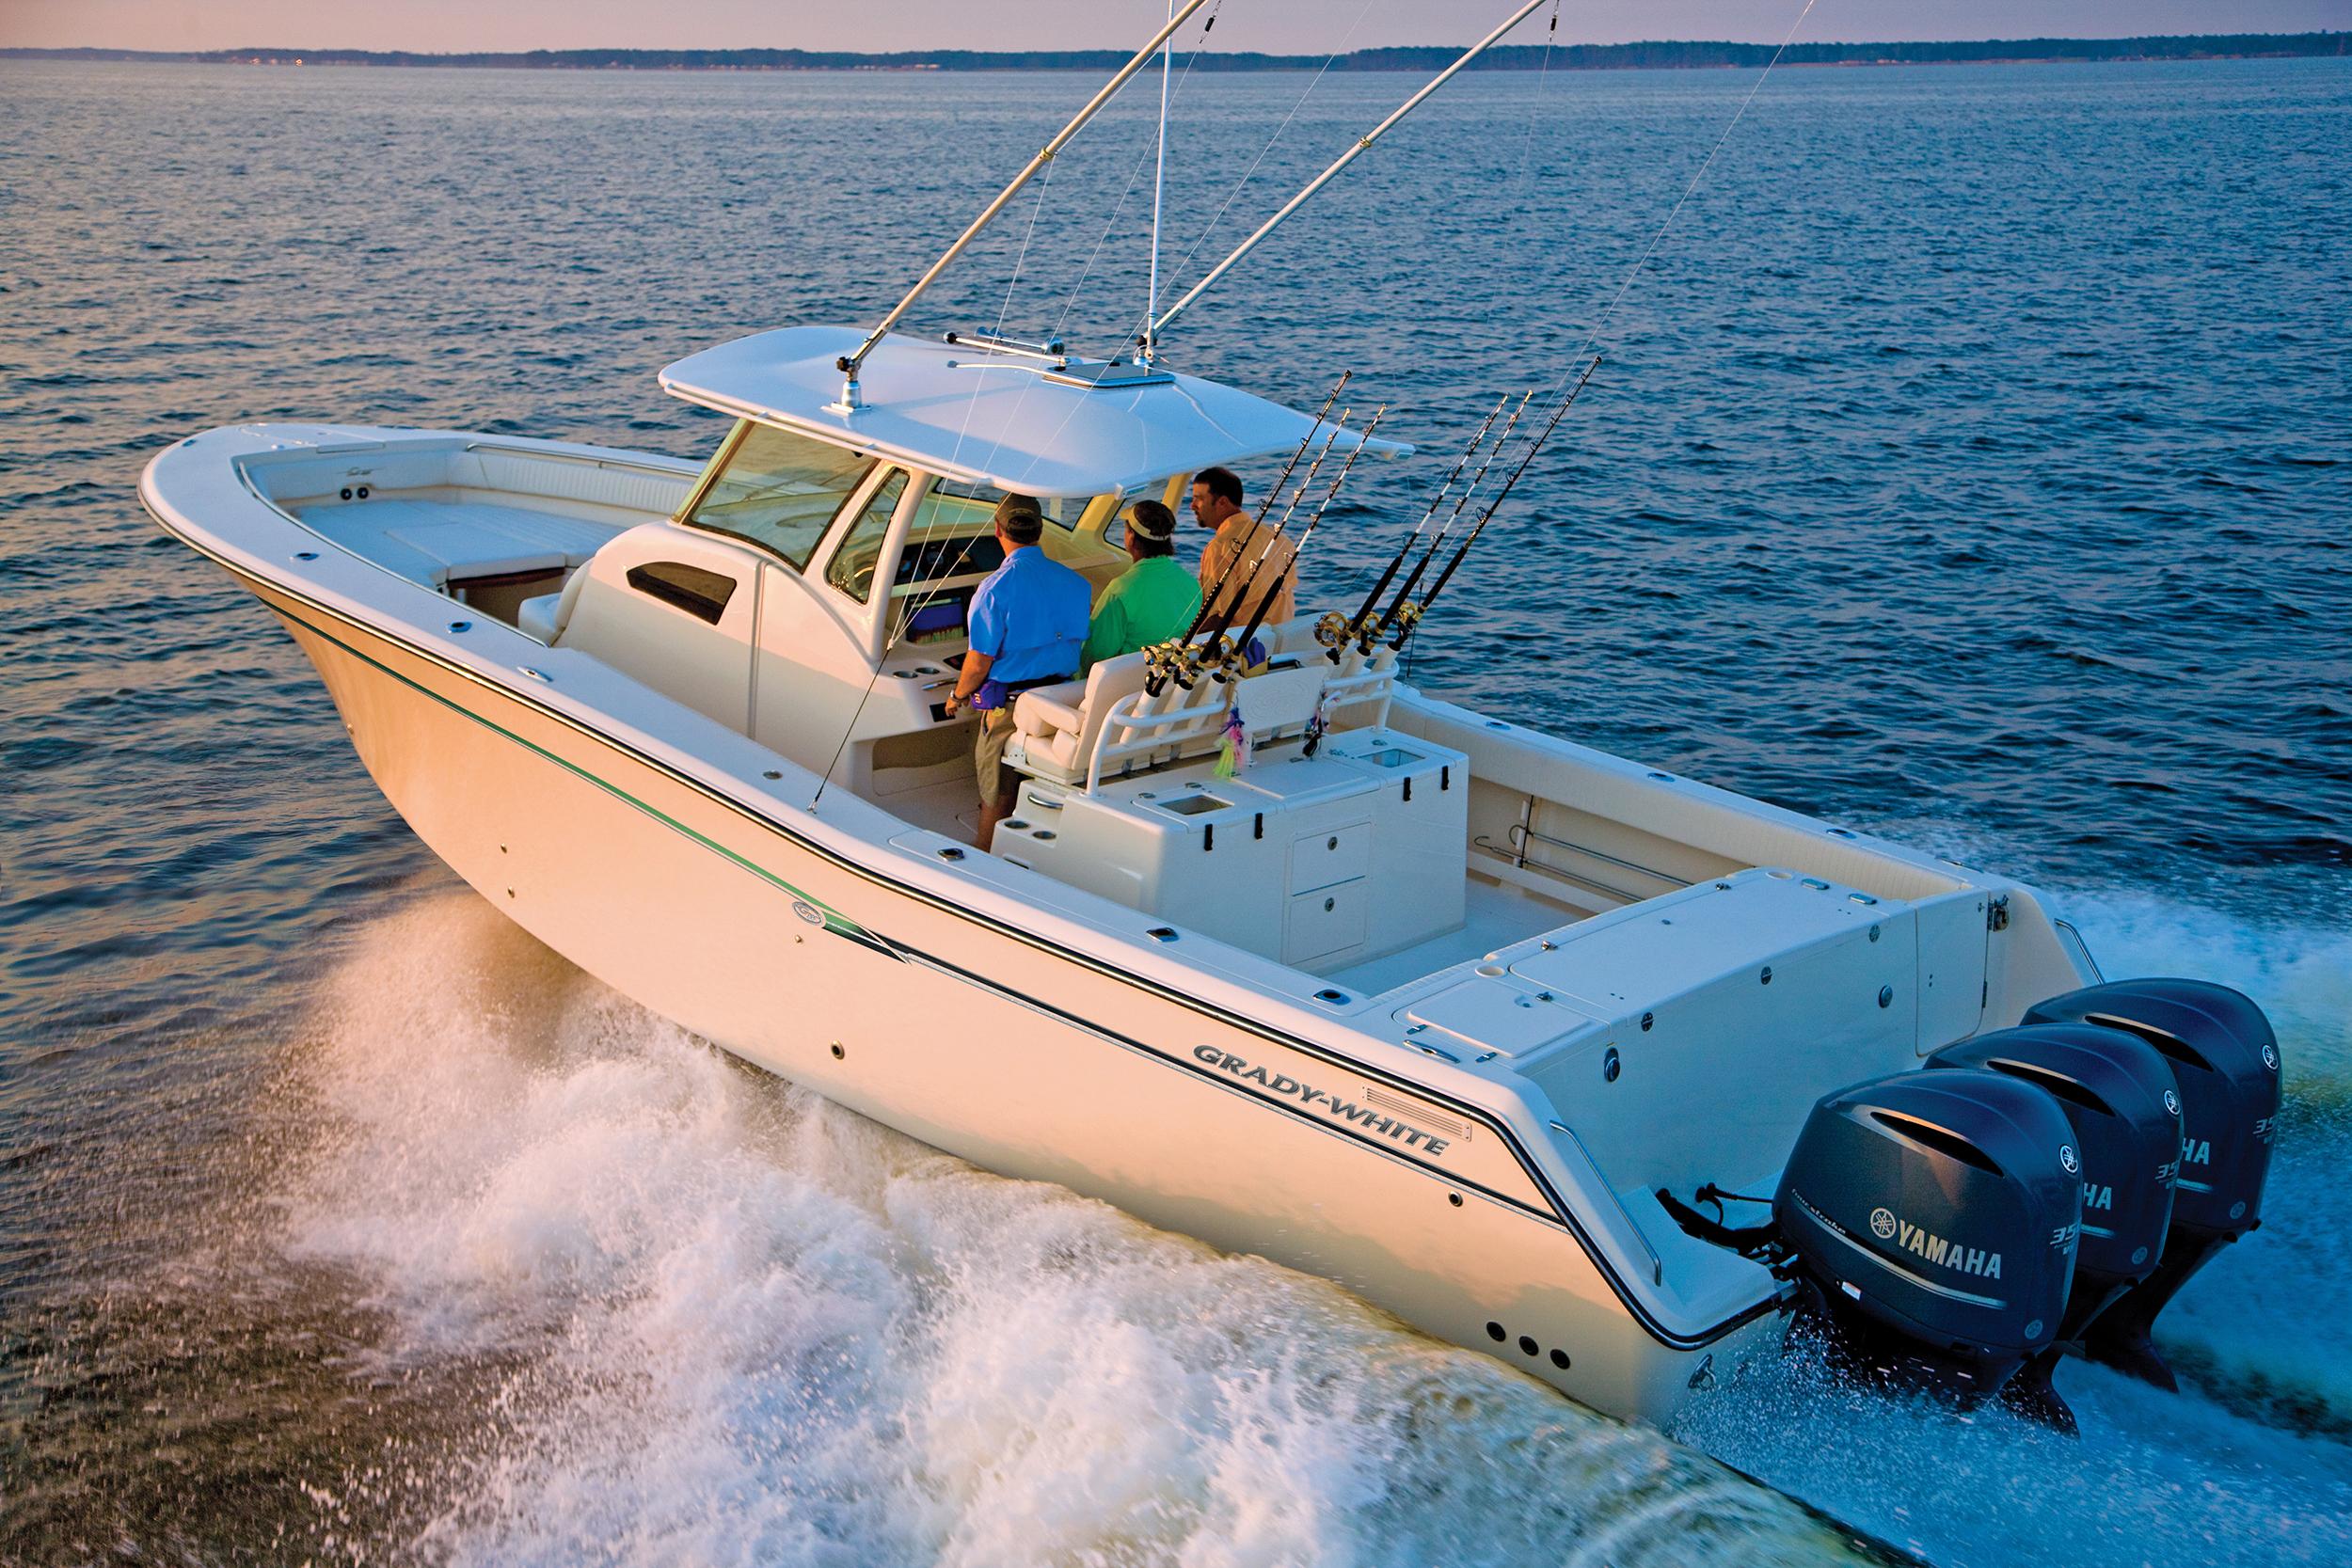 Fishing Boats With Yamaha, Evinrude, Suzuki, Mercury Outboard Motors